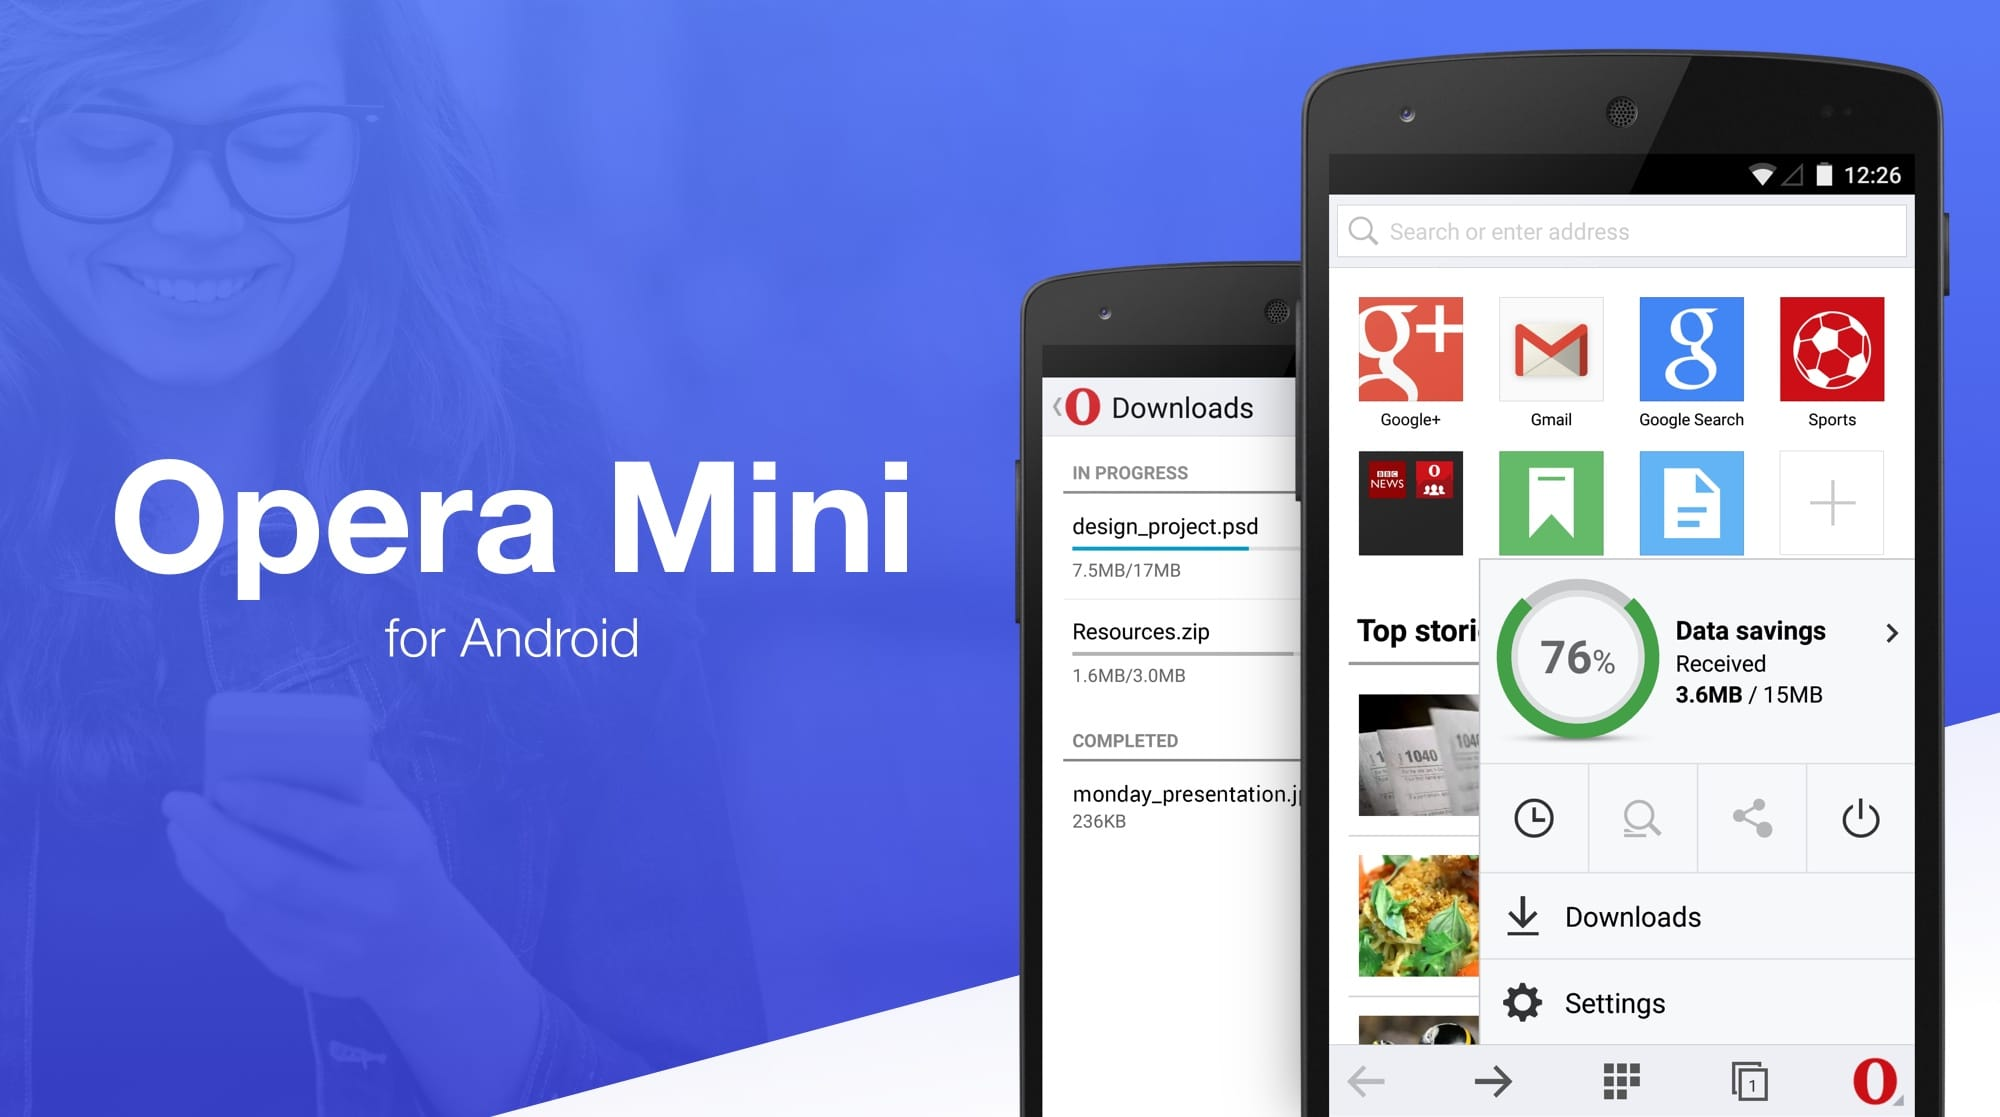 Opera Mini Android Download